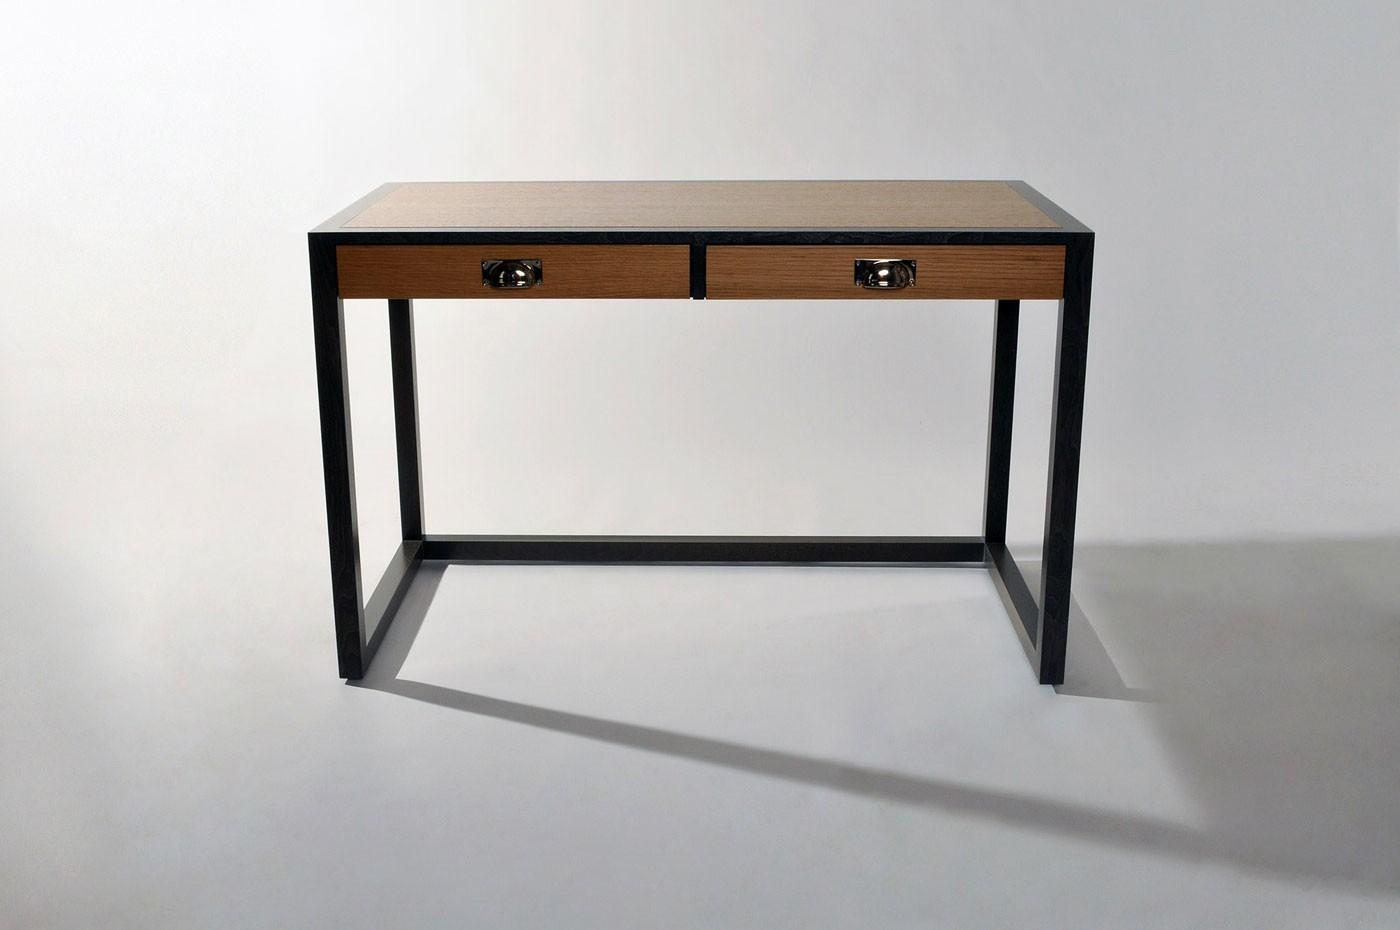 Matthew Fairbank - Barrett Desk 60B